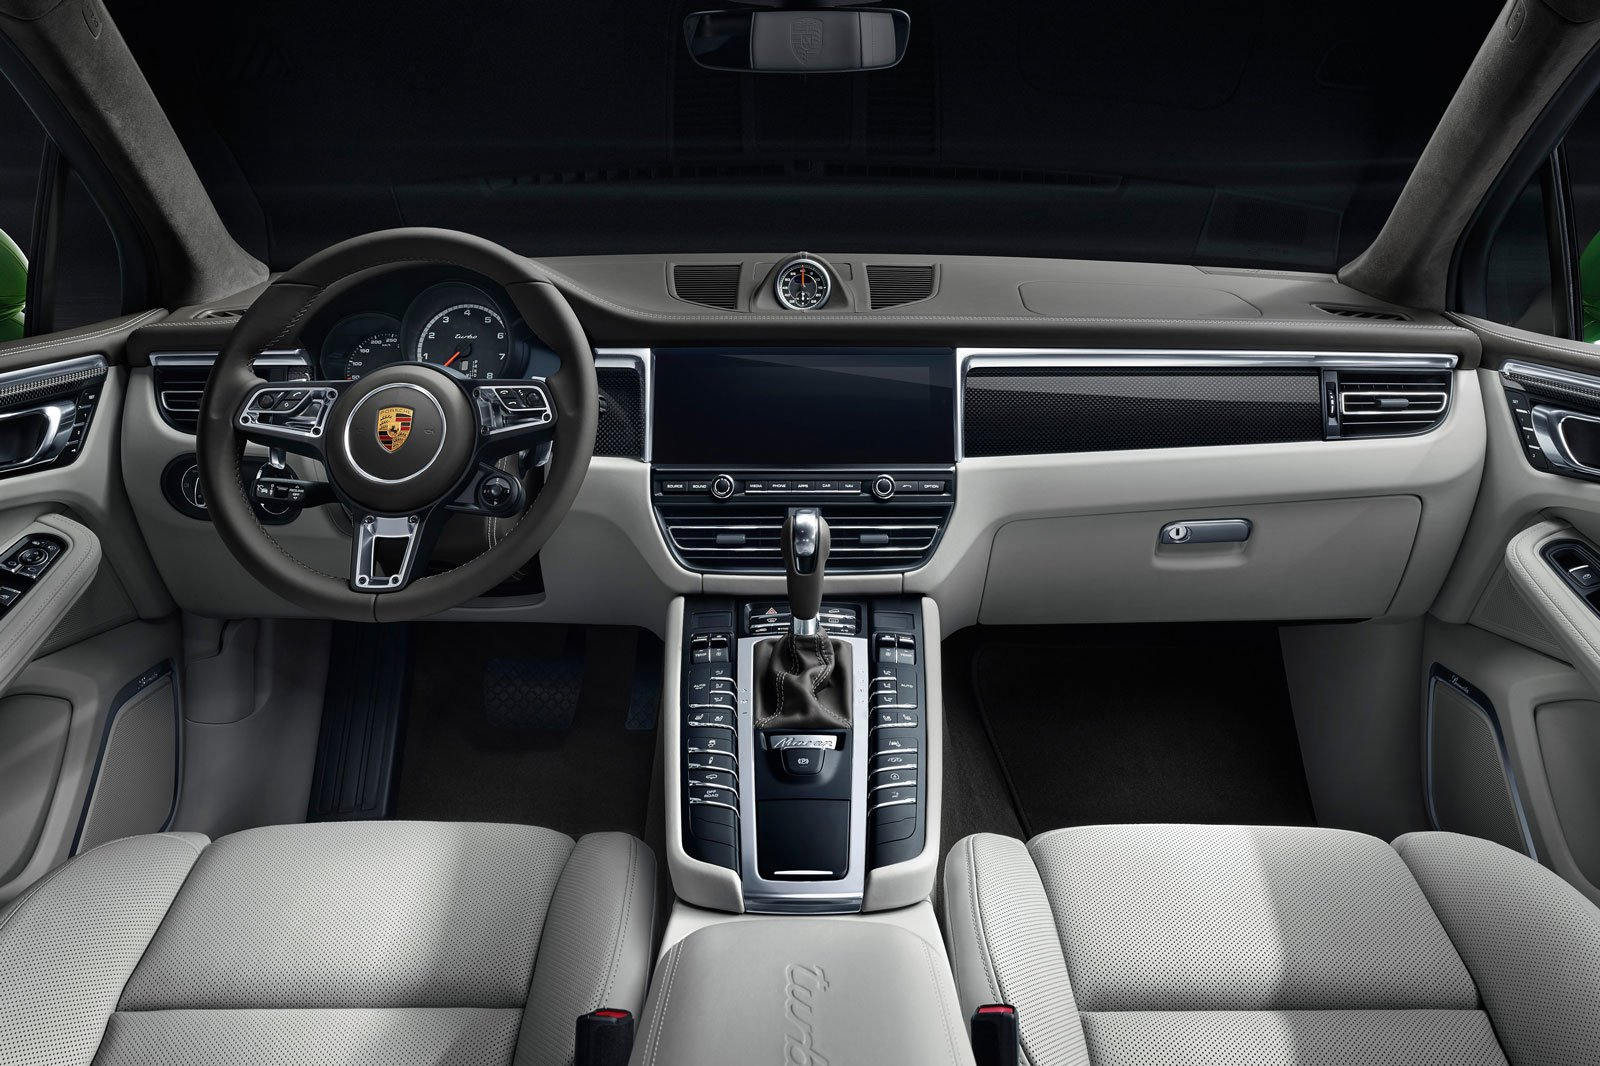 2019 porsche macan turbo interior dashboard